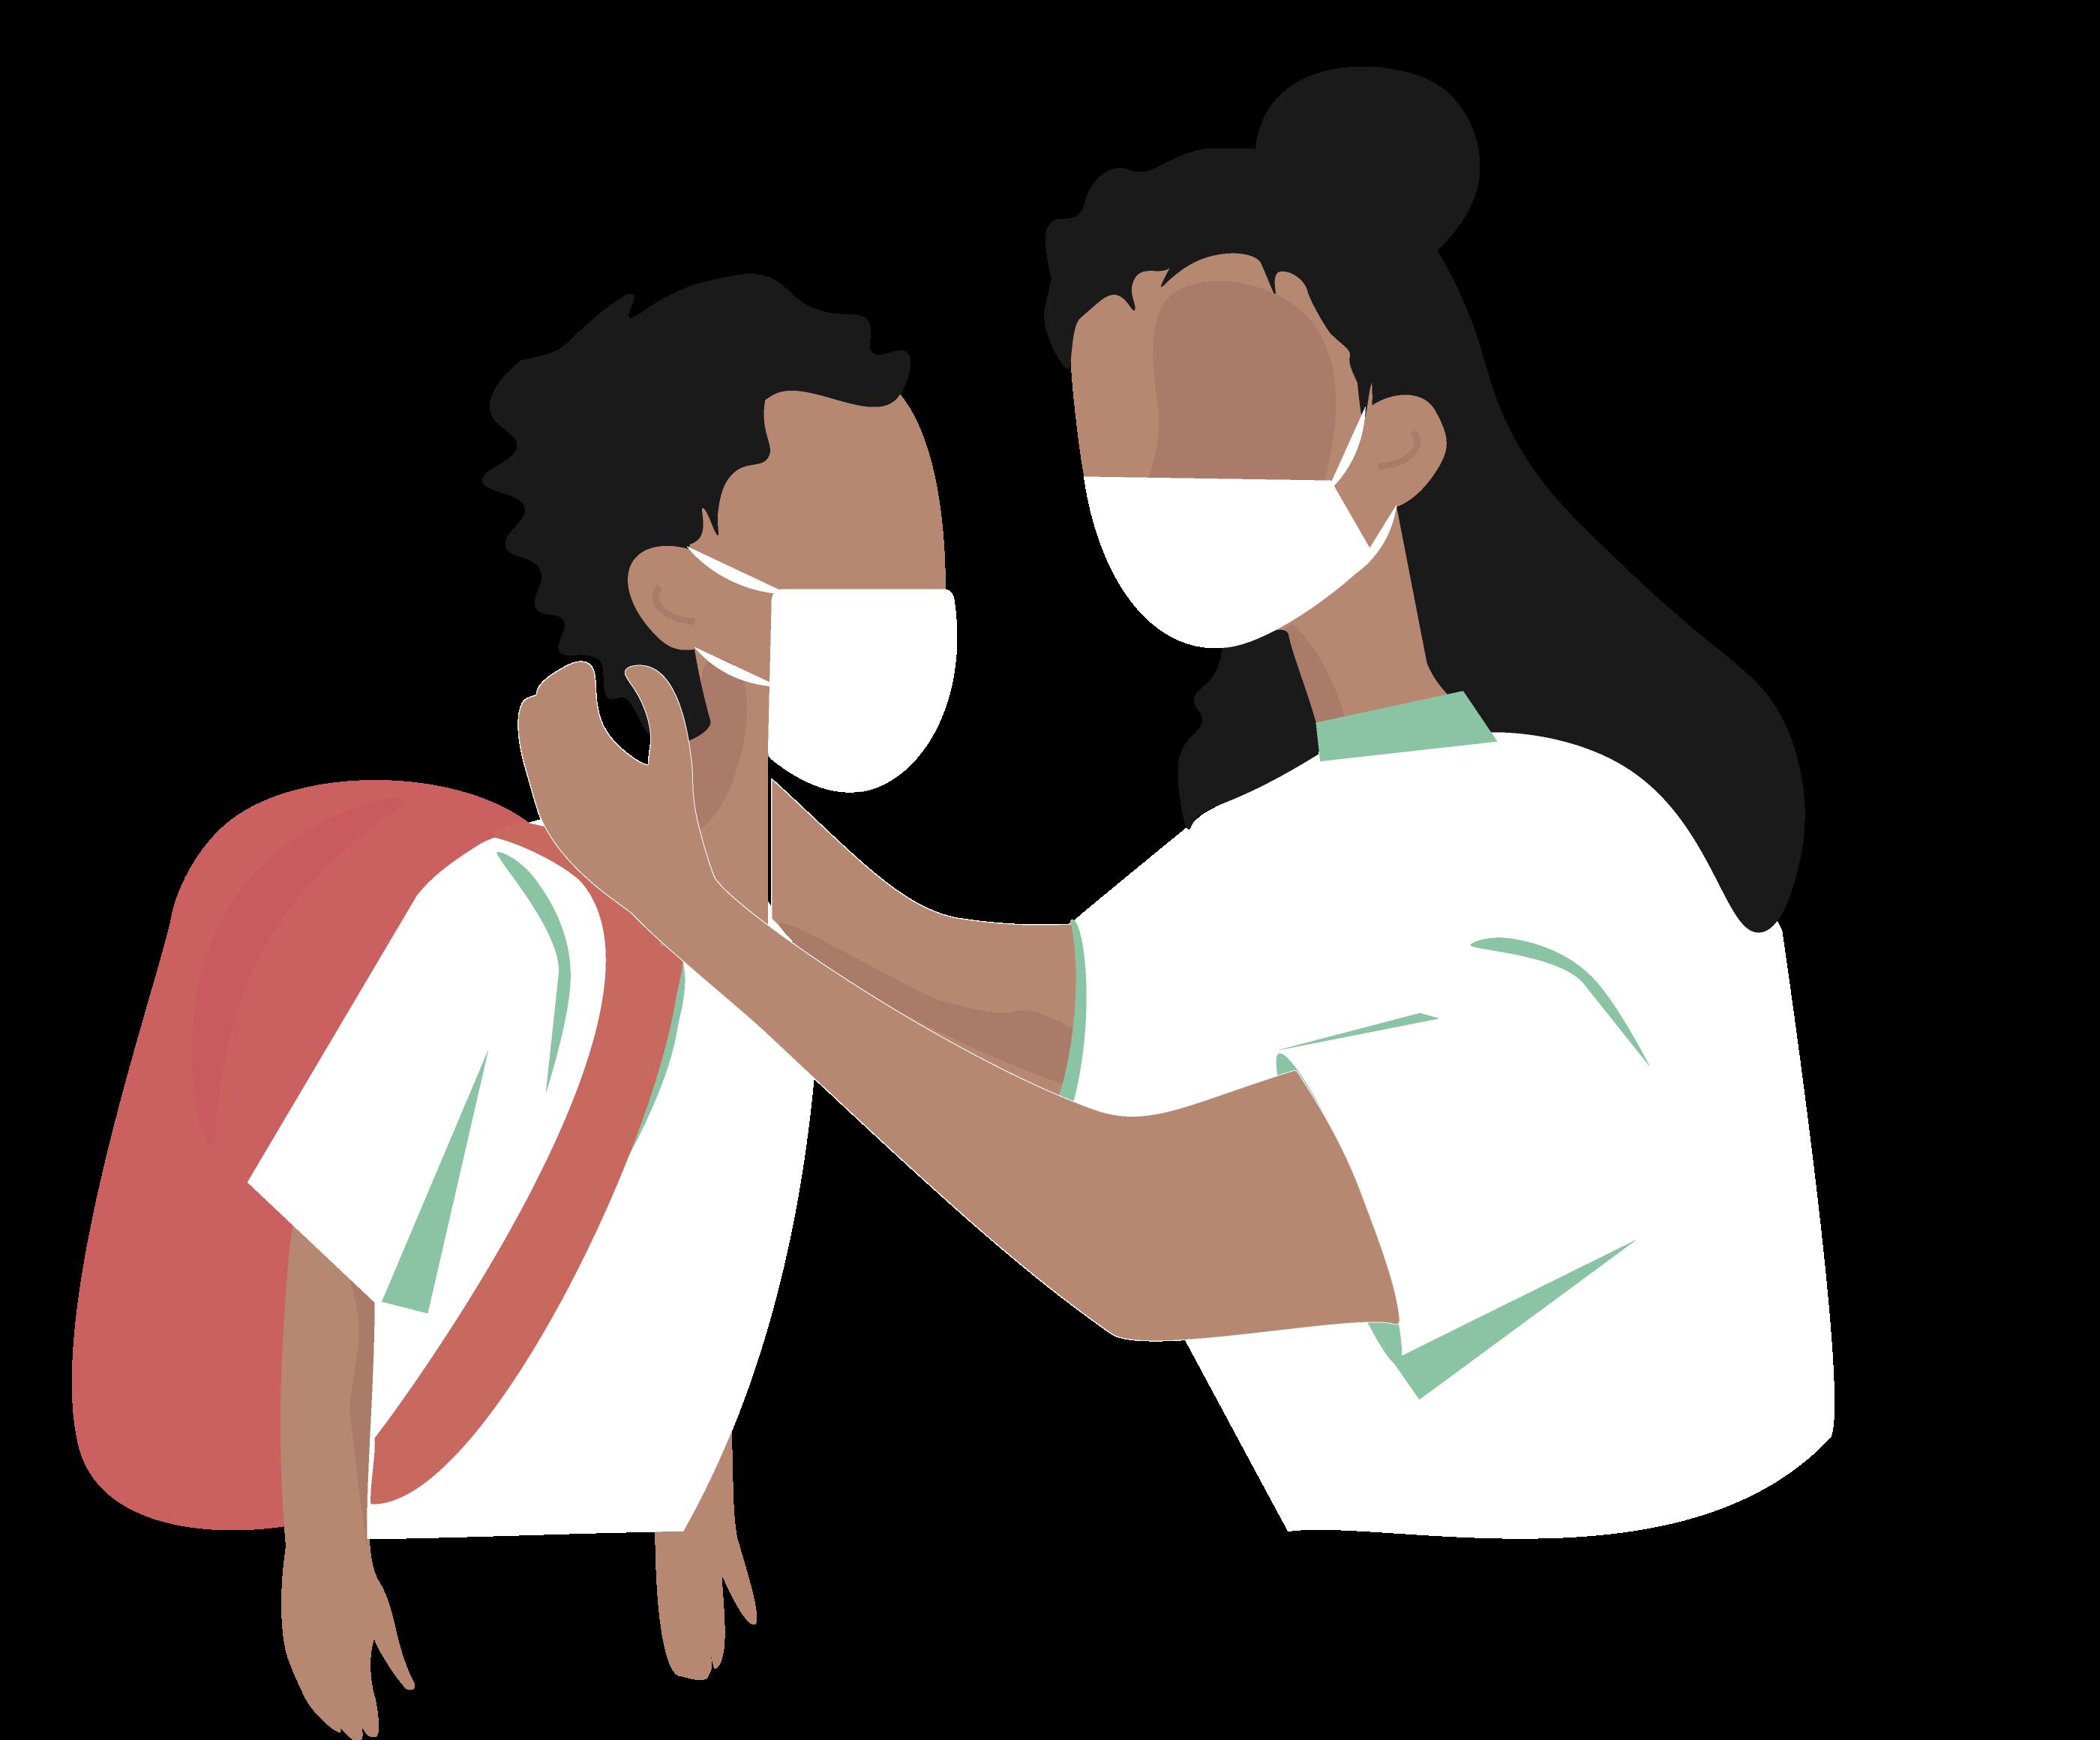 corona soforthilfe illustration10